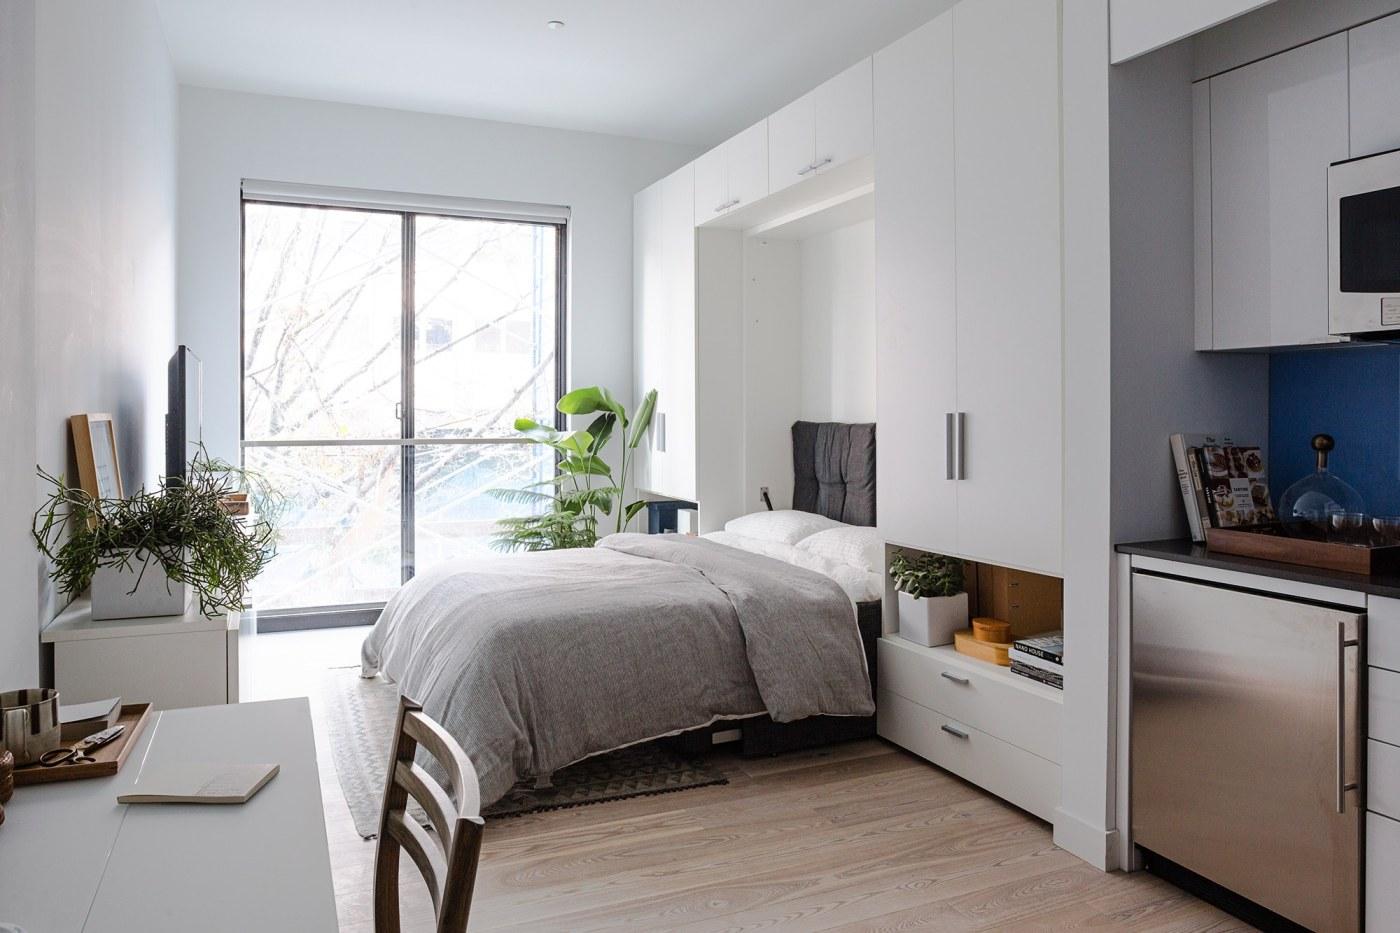 Micro-unit housing